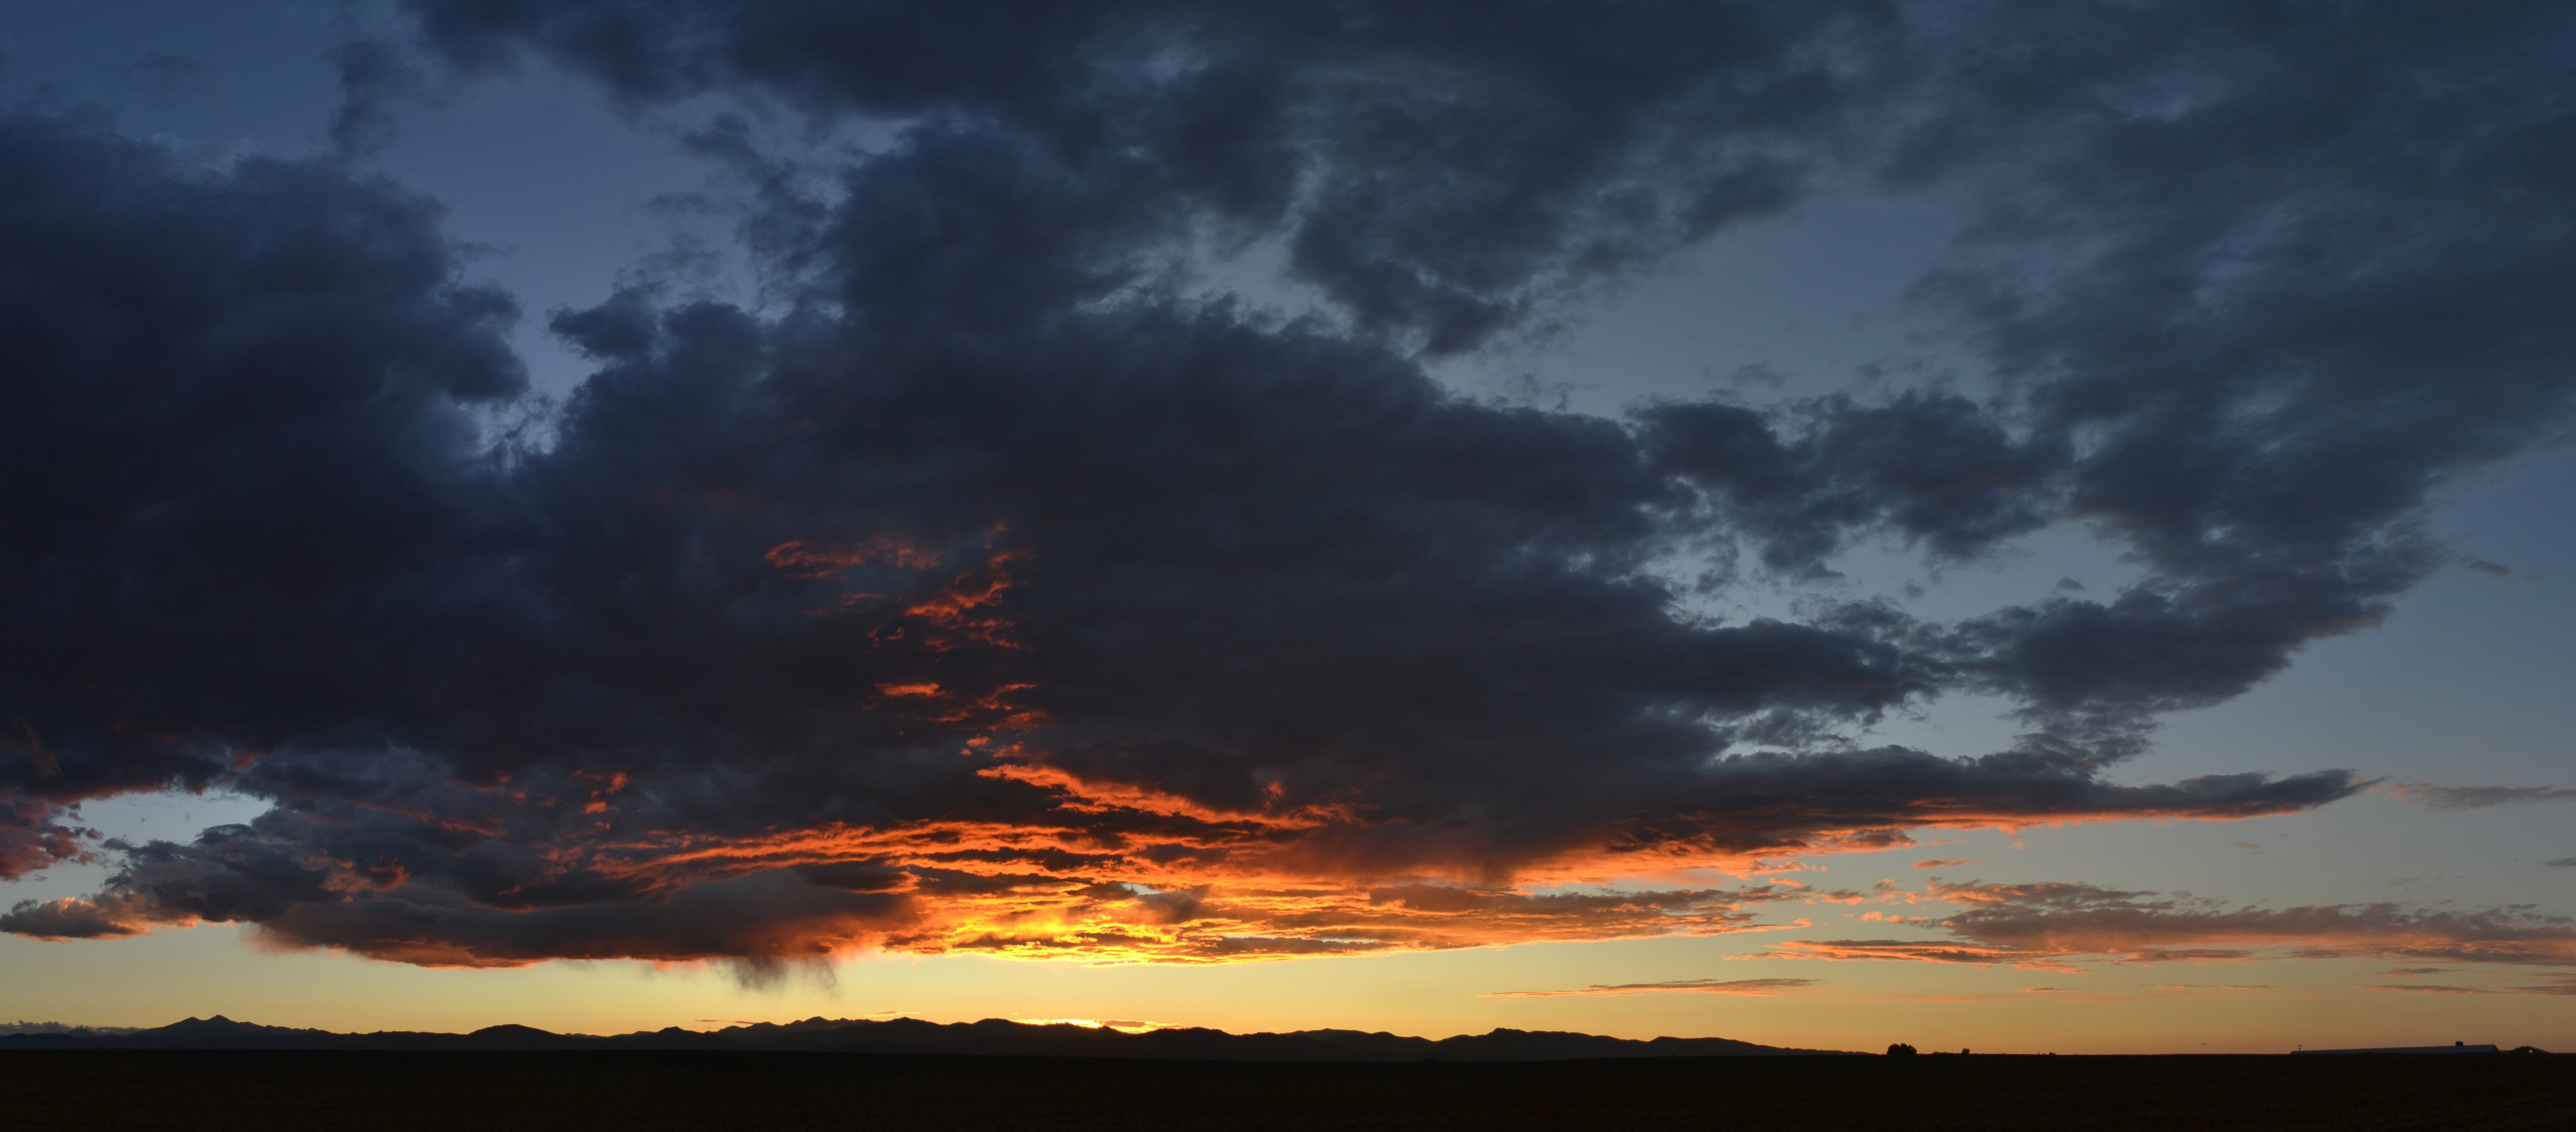 Stormy sunset photo